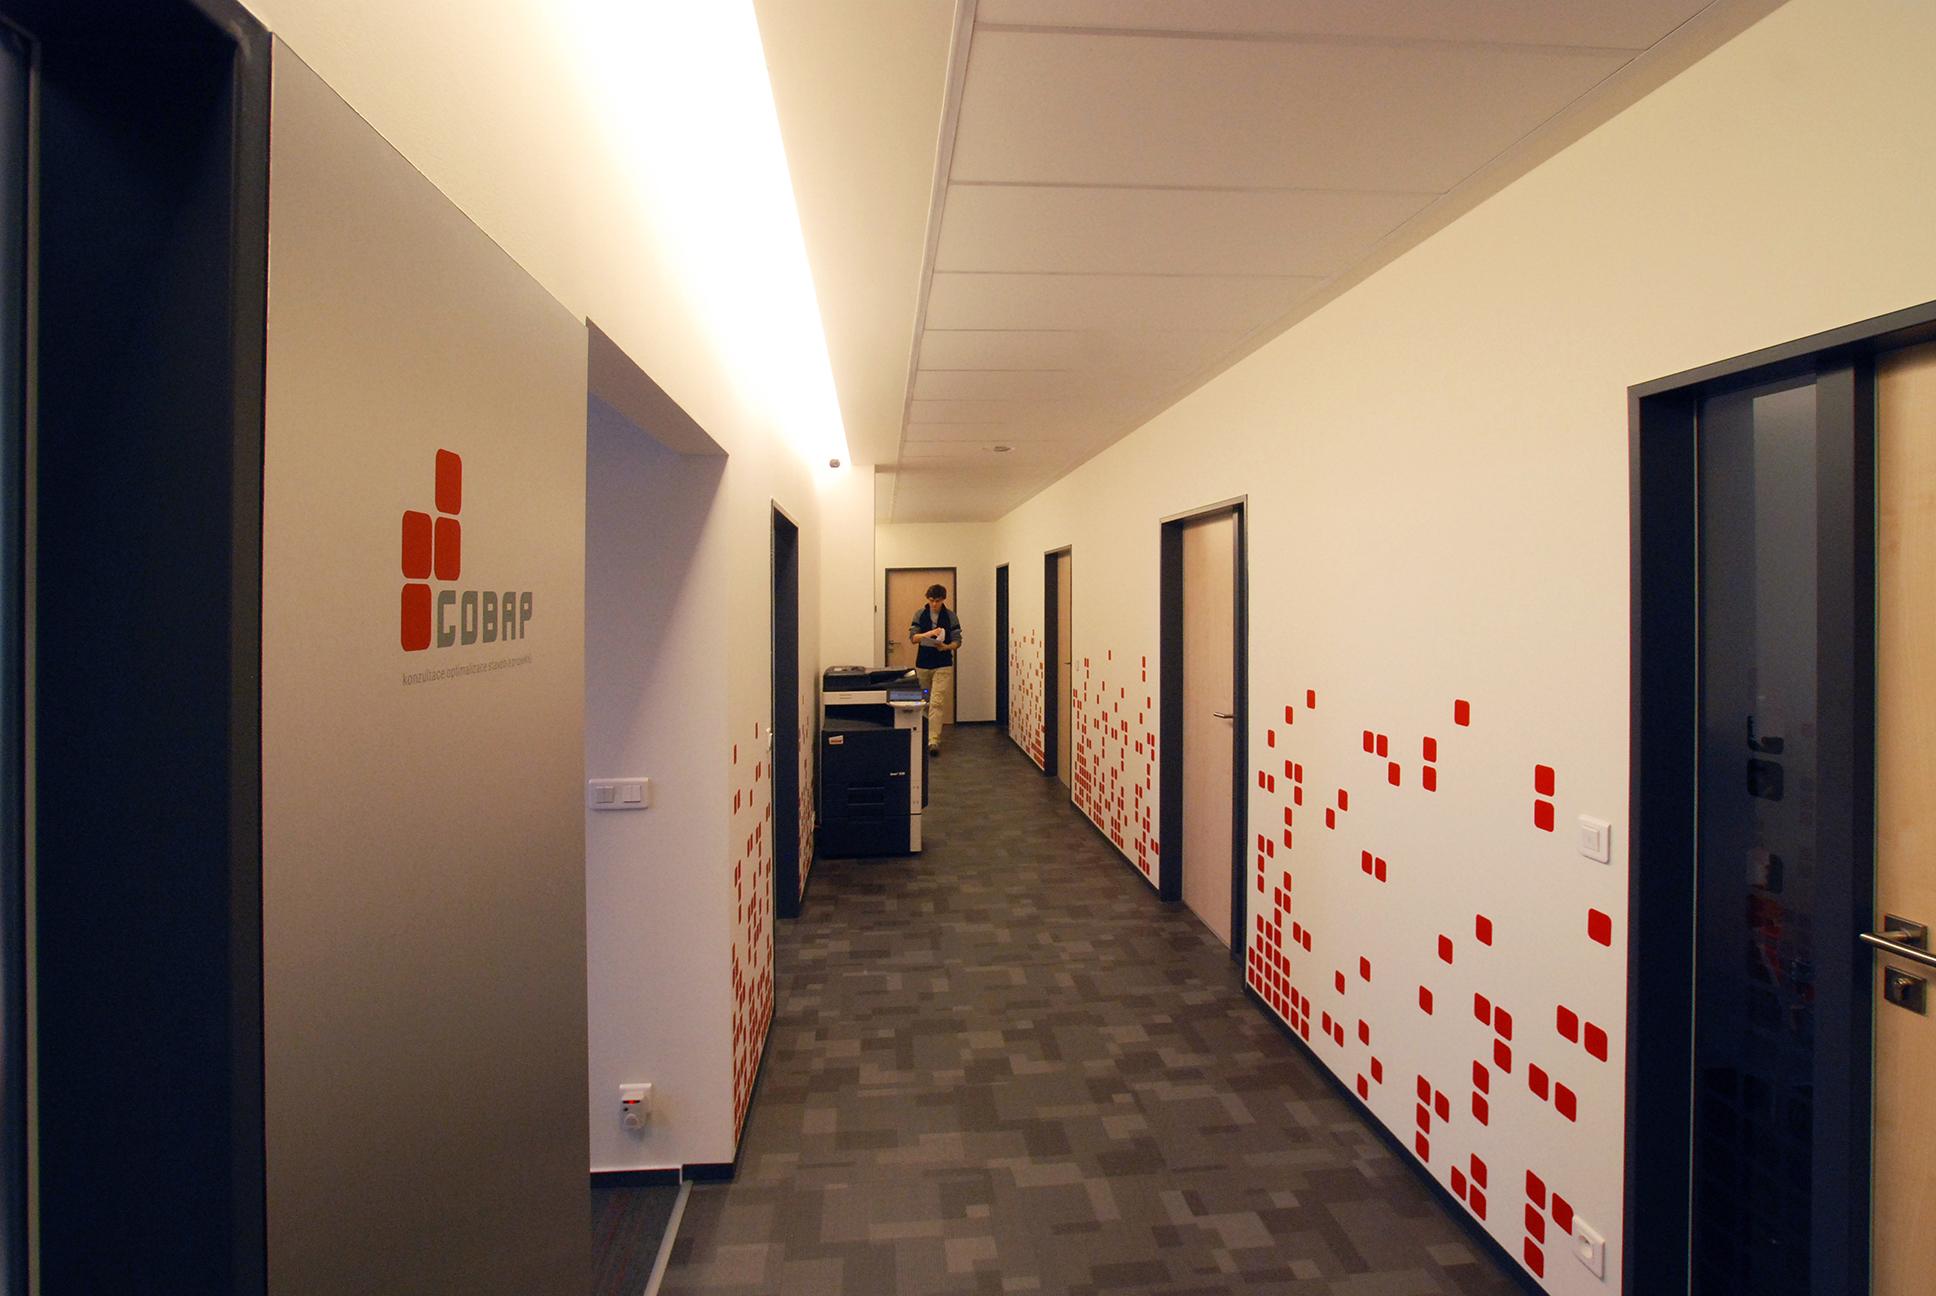 Cobap – polepy v interiérech firmy